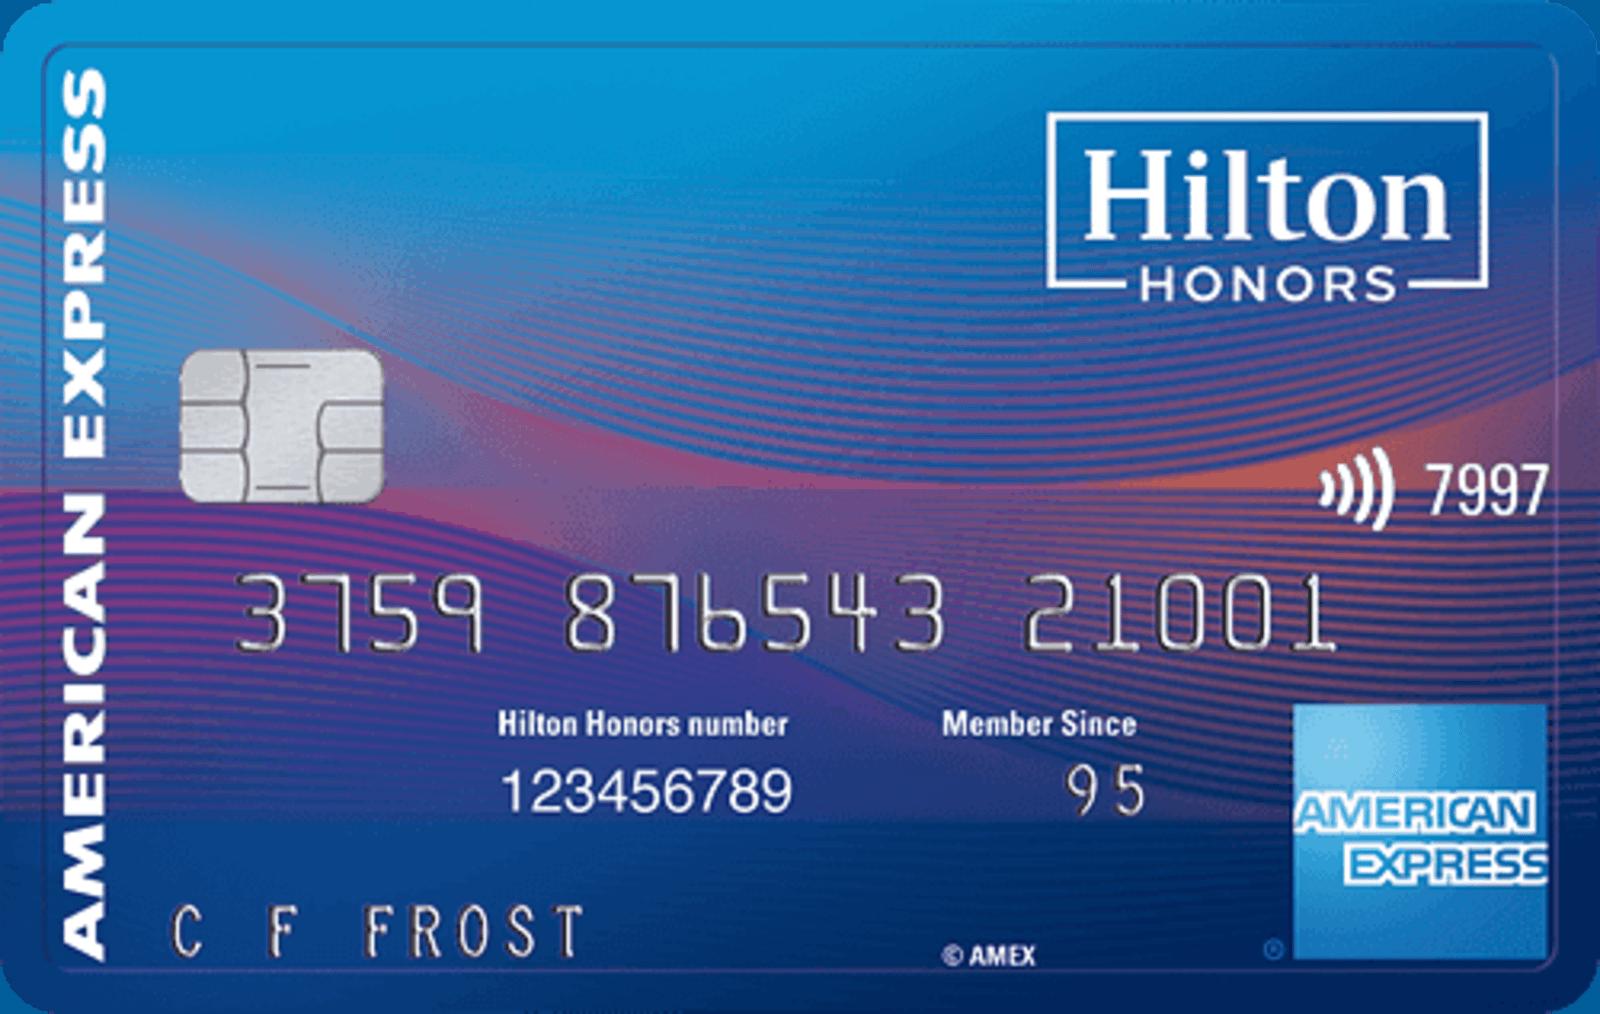 Best Hilton Credit Cards of 2019 - ValuePenguin